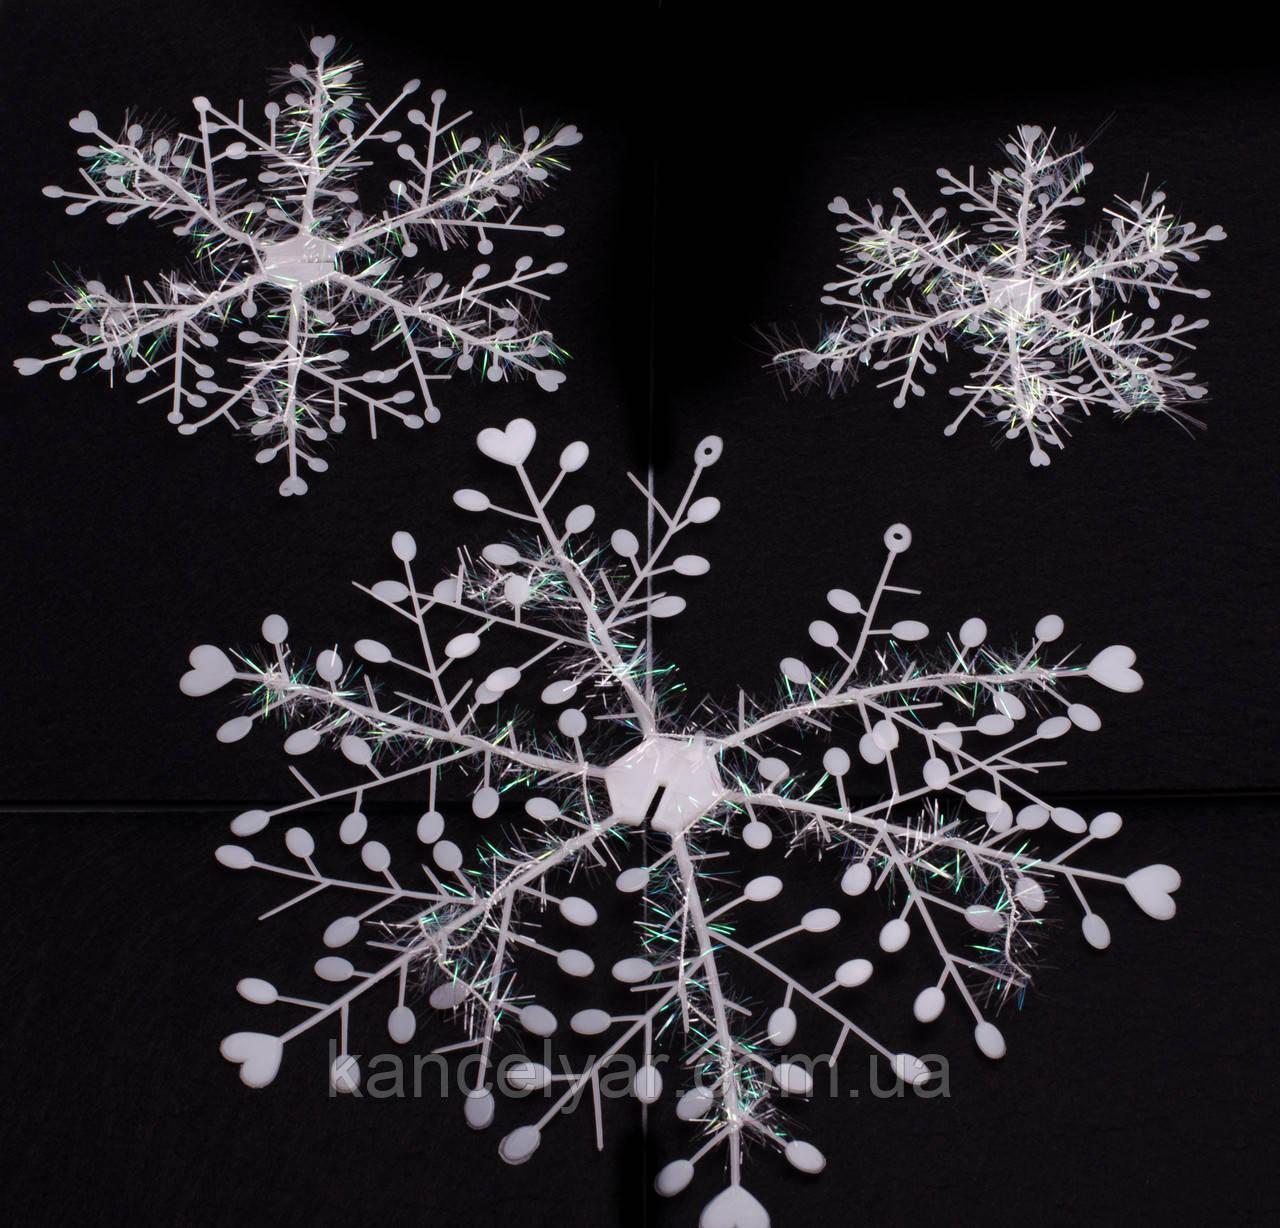 Снежинки: 2 шт. х 15 см, 2 шт. х 20 см, 2 шт. х 30 см